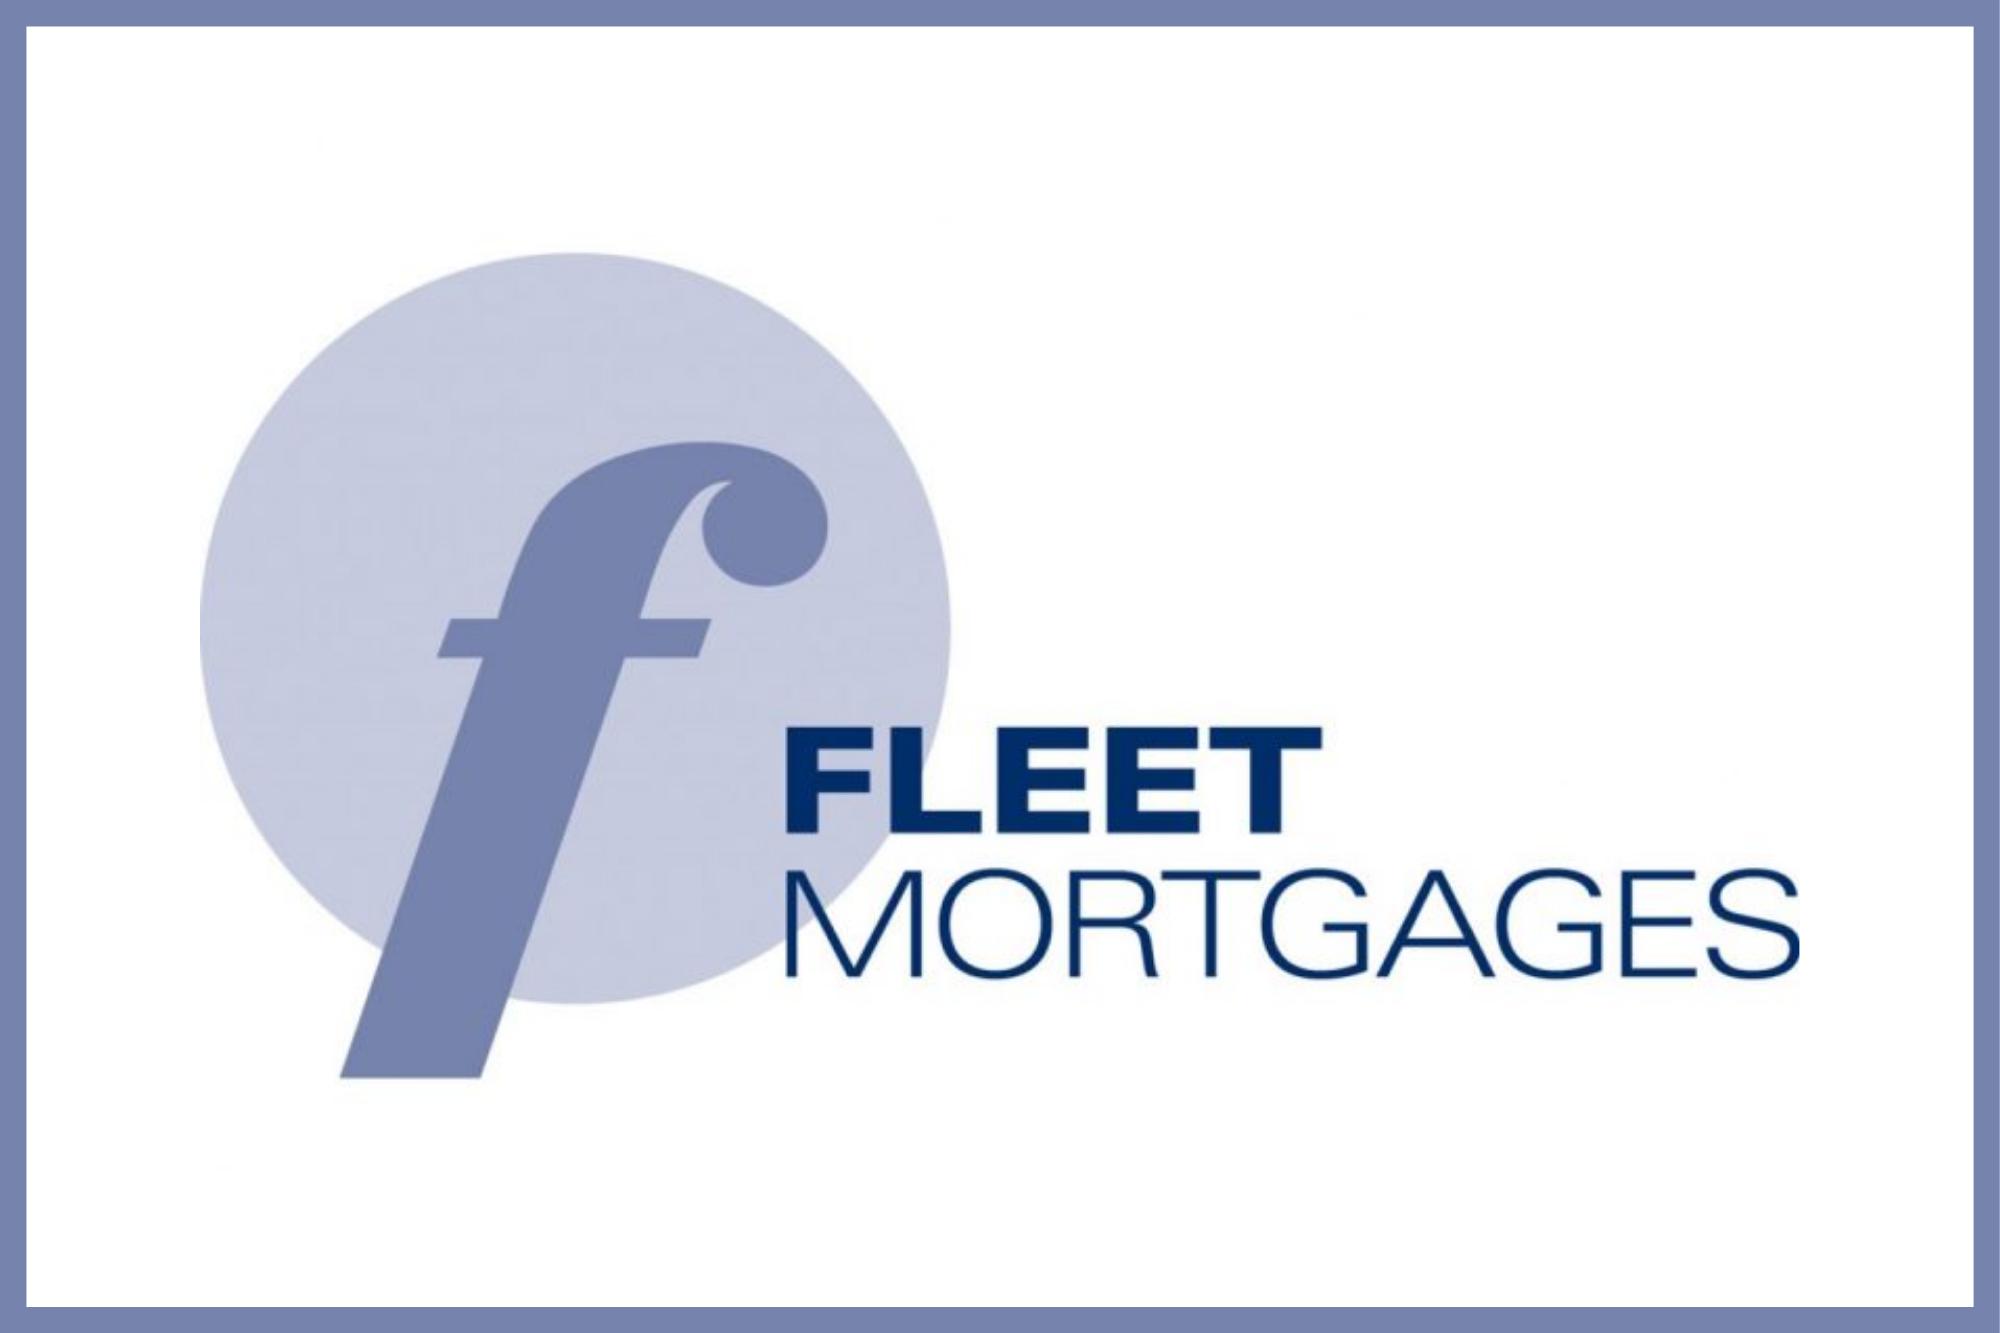 Fleet Mortgages